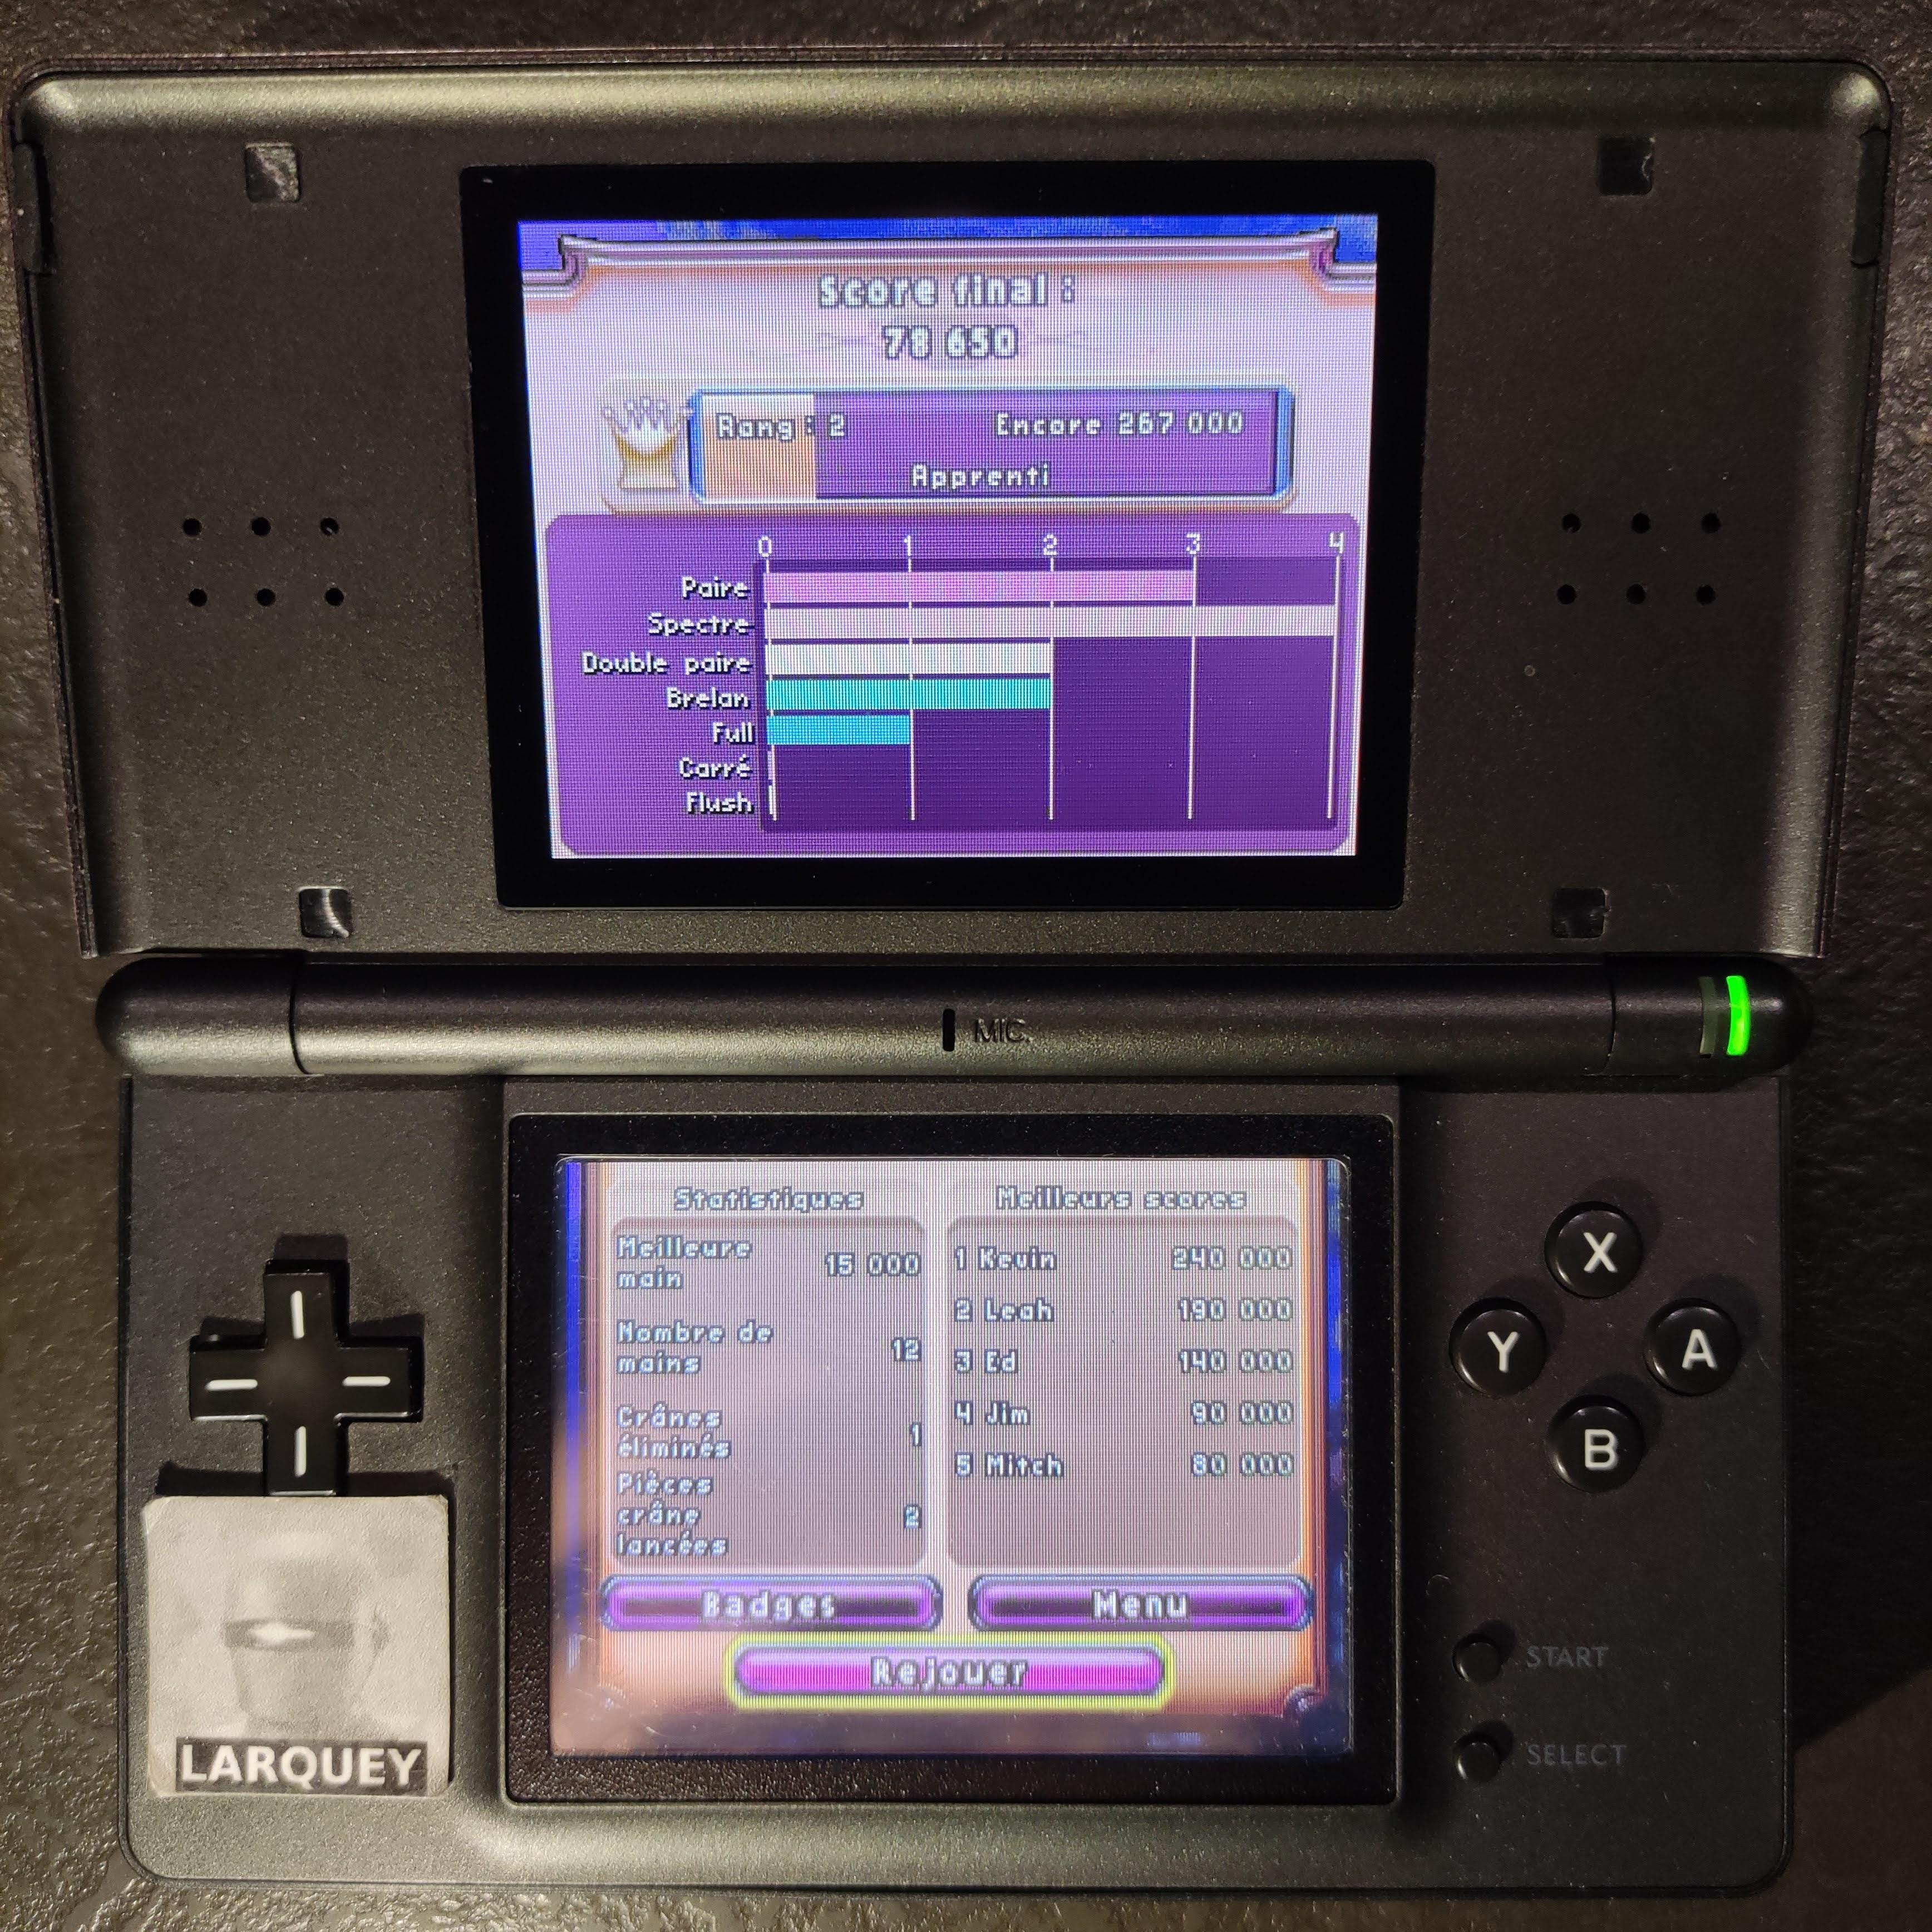 Larquey: Bejeweled 3: Poker [Best Hand] (Nintendo DS) 15,000 points on 2020-09-26 03:56:00